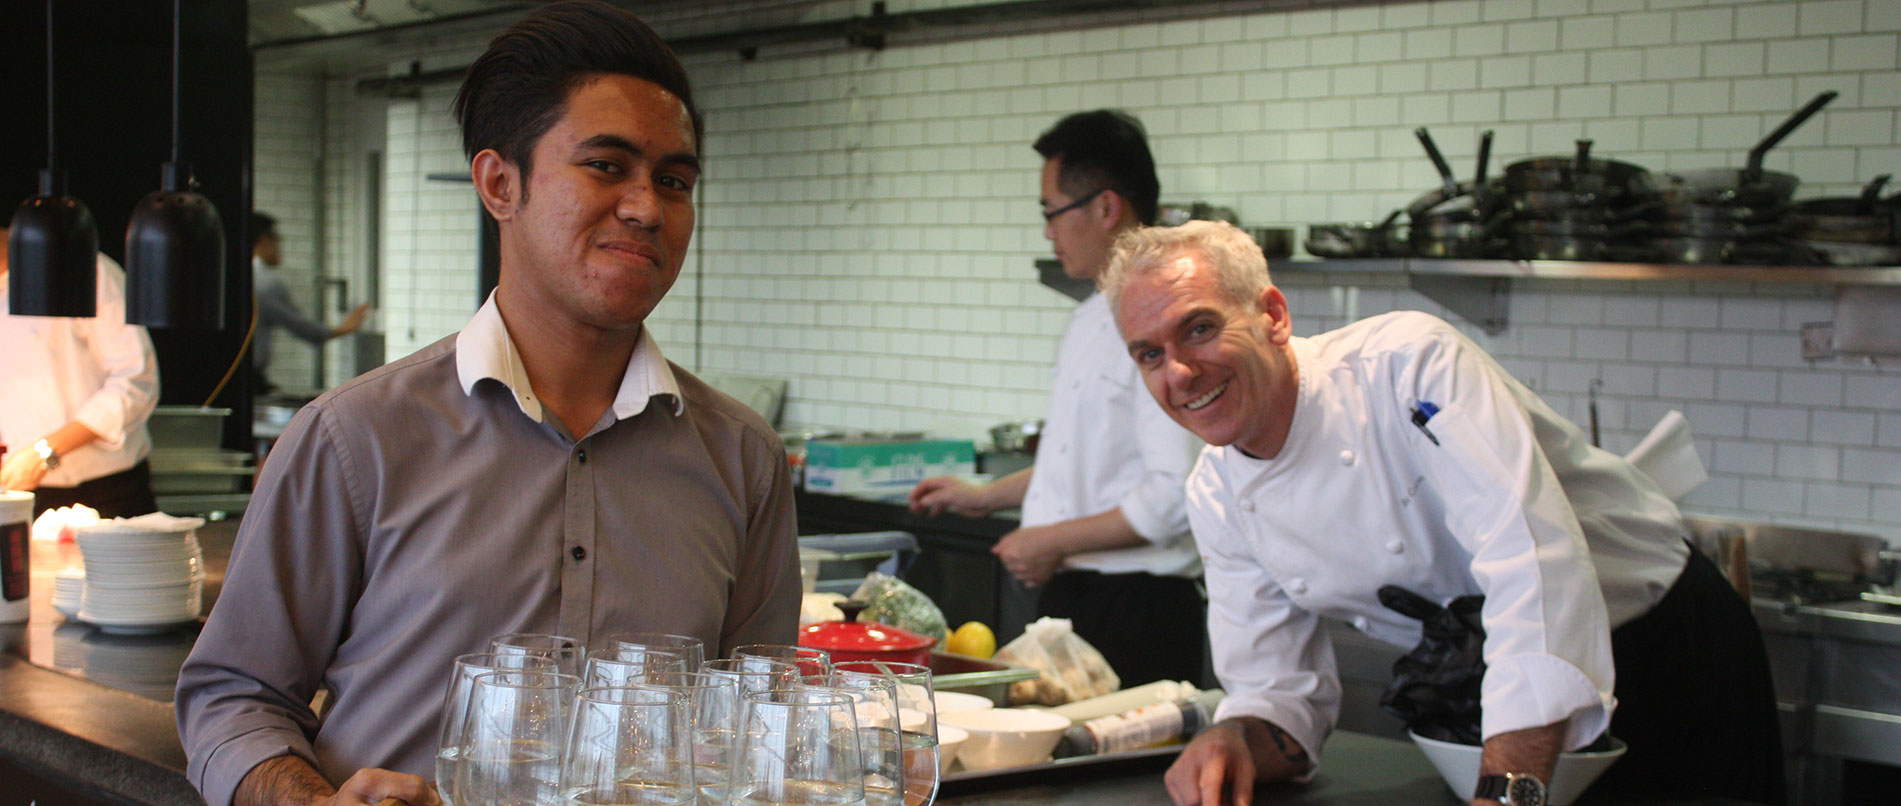 Hospitality Internship in China